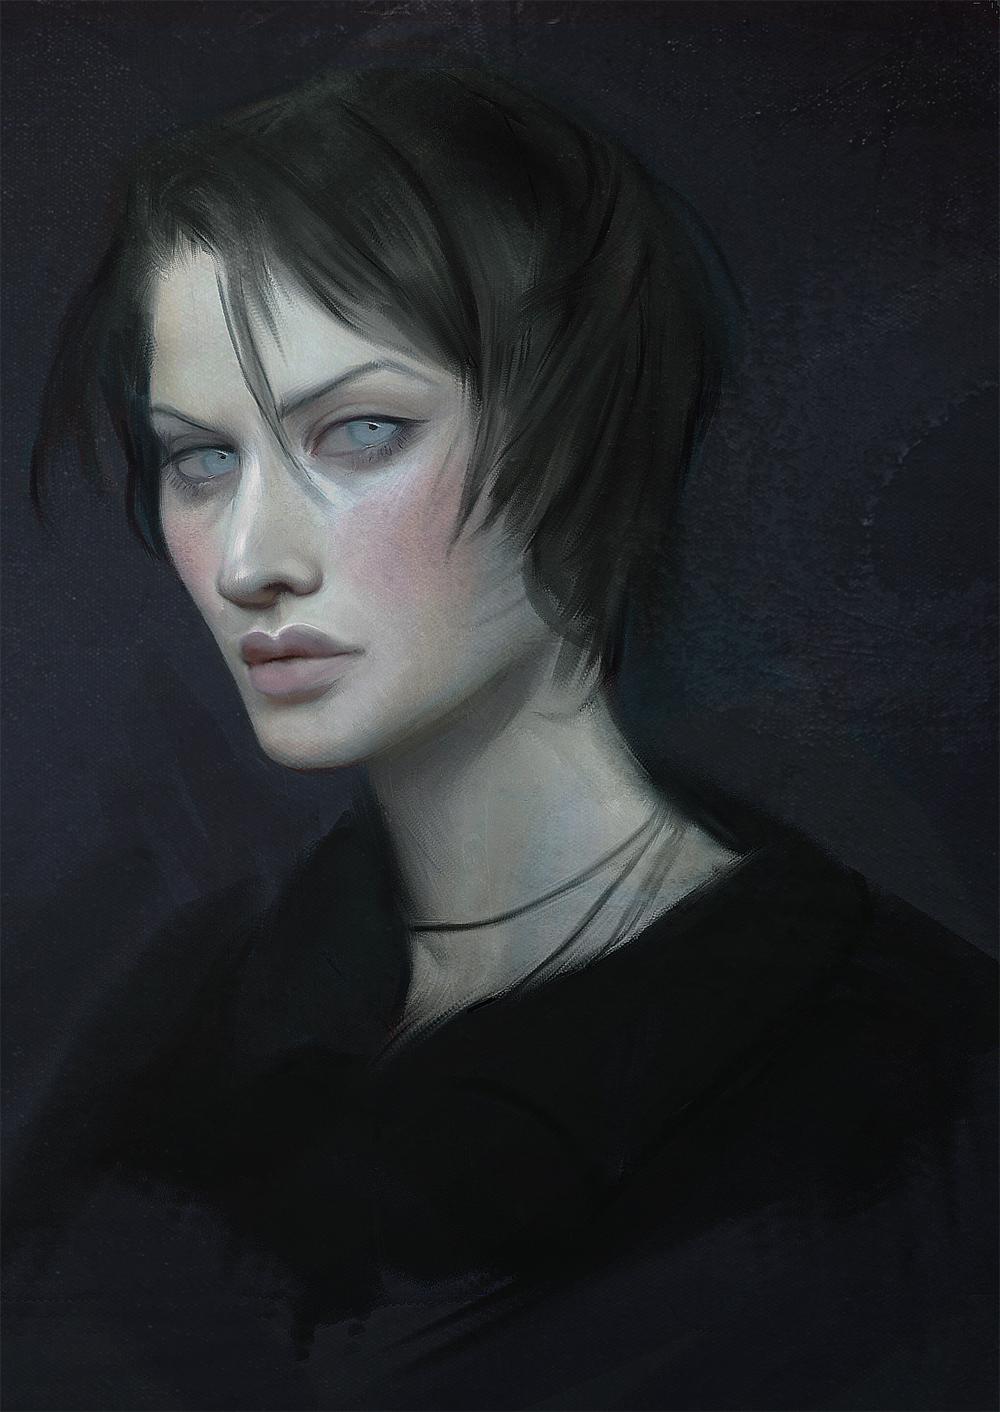 Portrait by Pheberoni